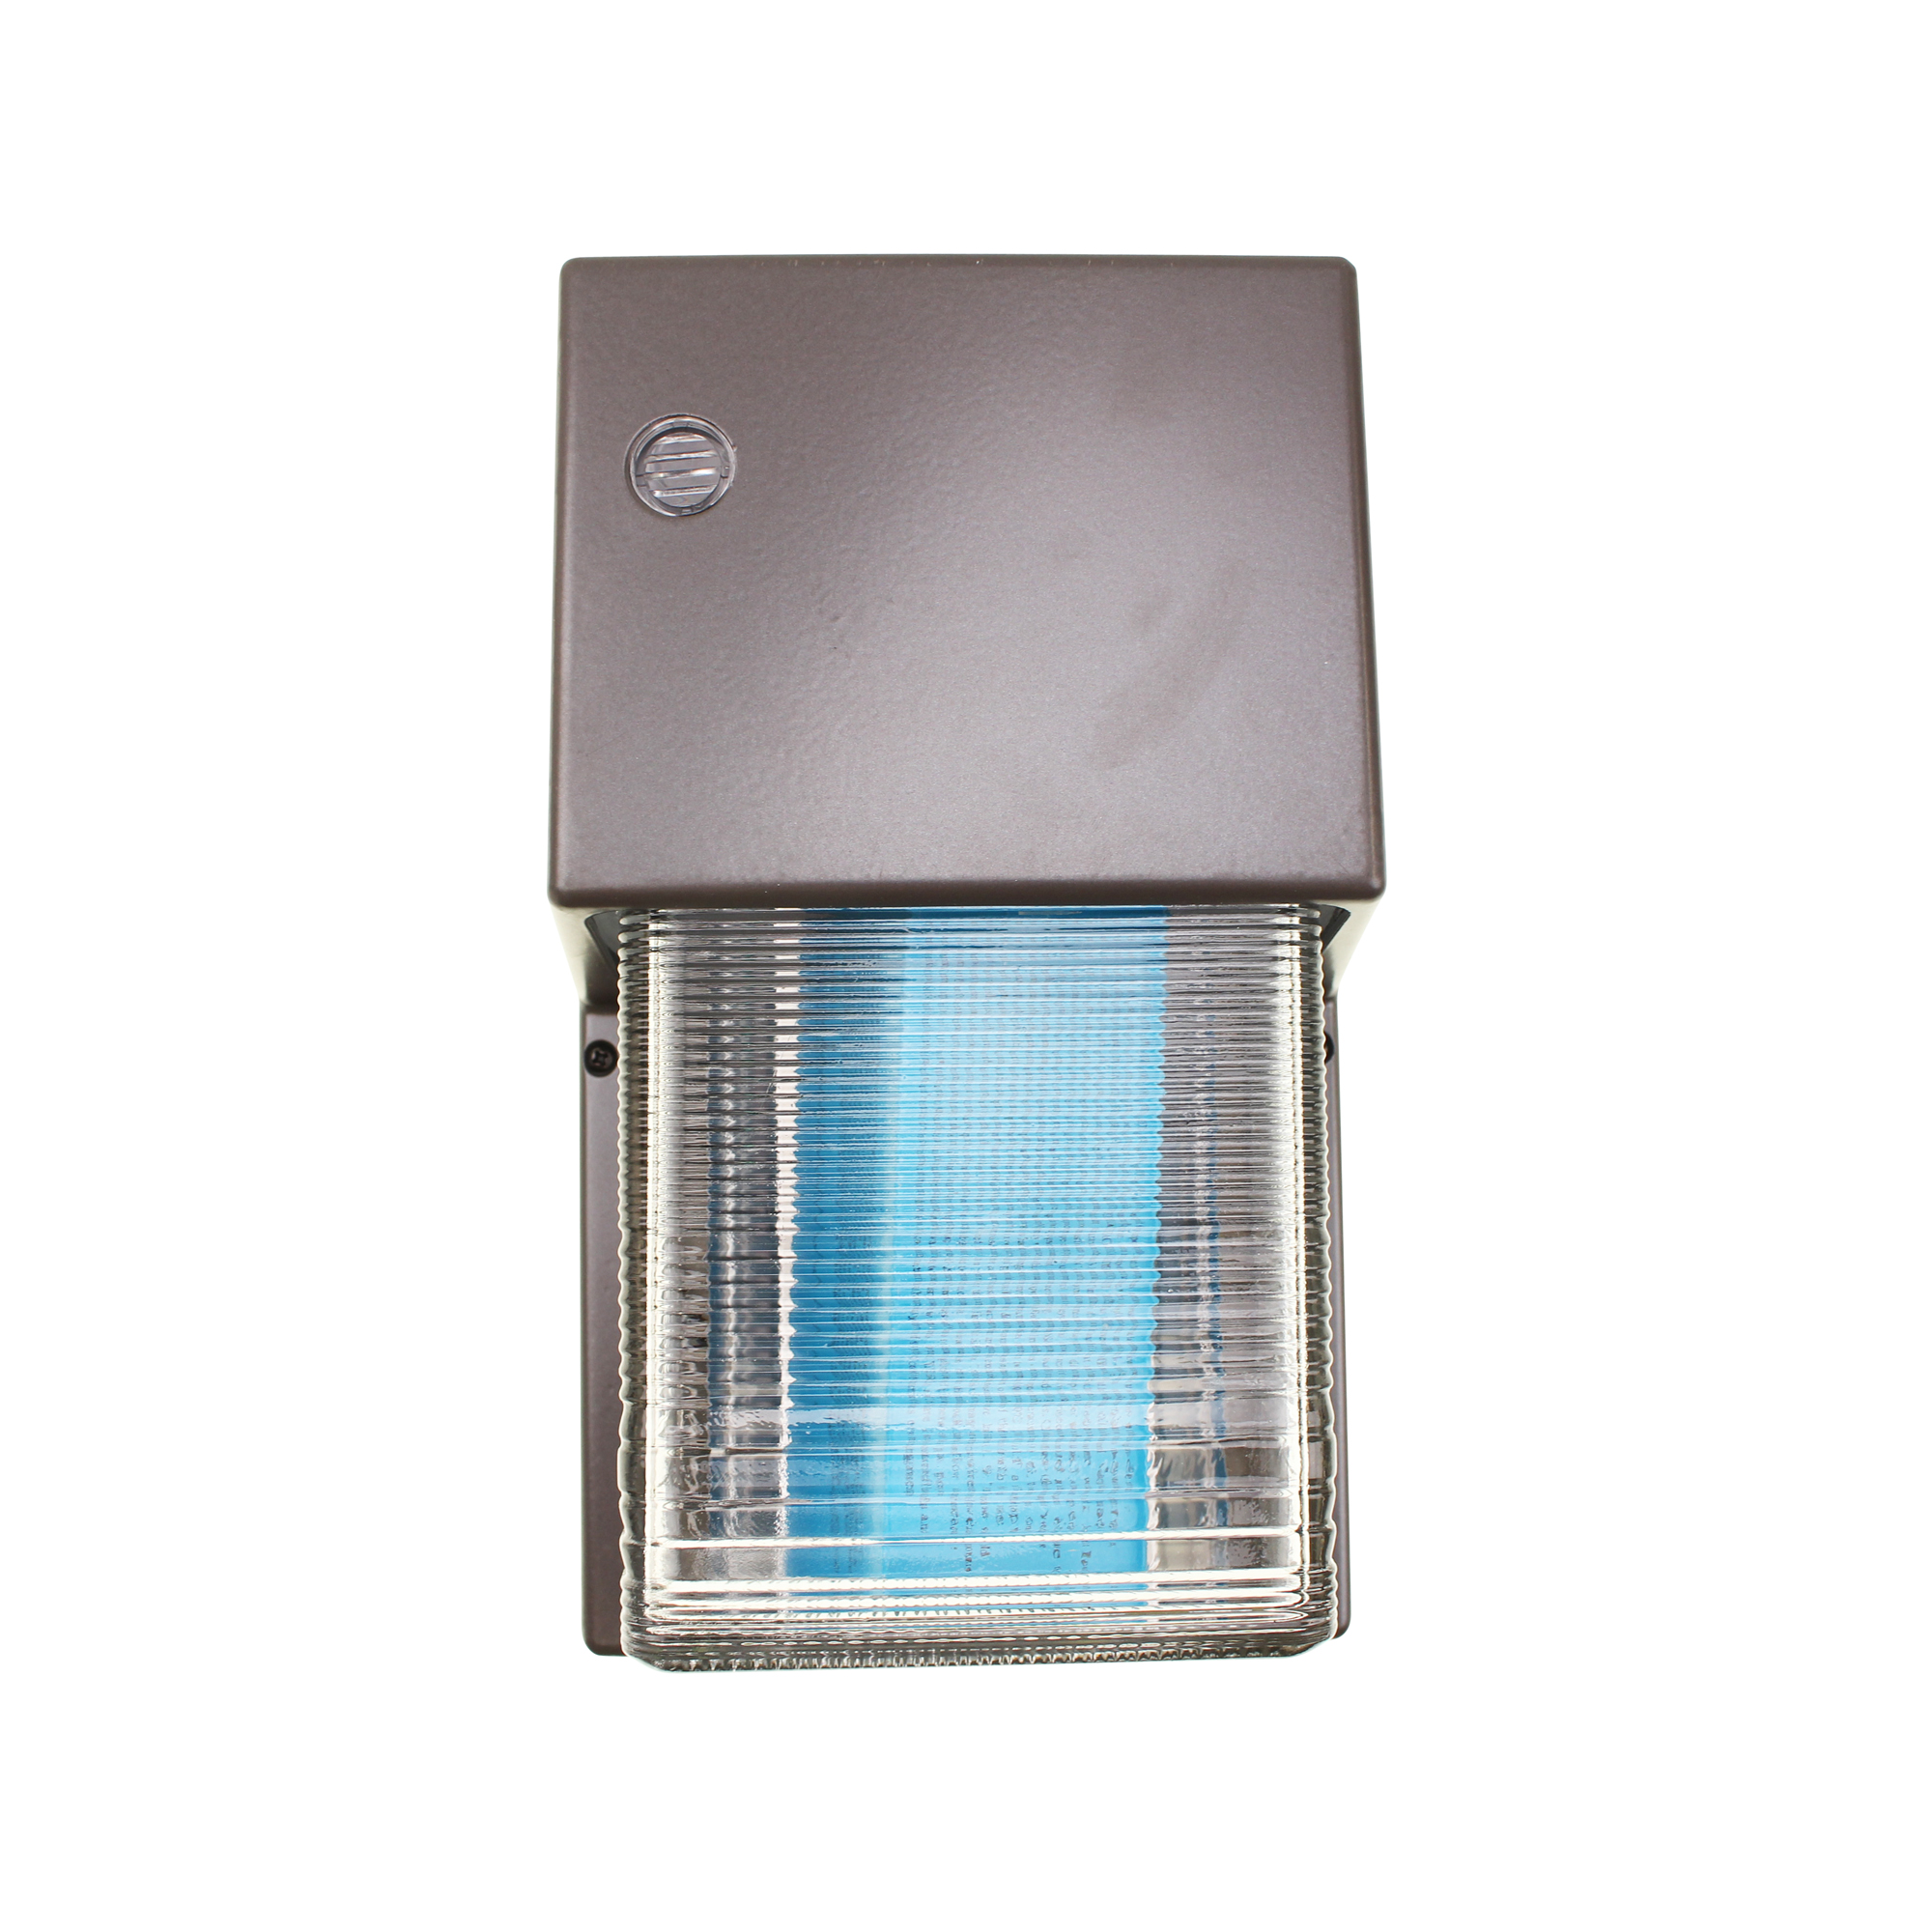 Nsi wpgc100mhq mini metal halide wall pack light fixture 100w mh nsi wpgc100mhq mini metal halide wall pack light arubaitofo Choice Image